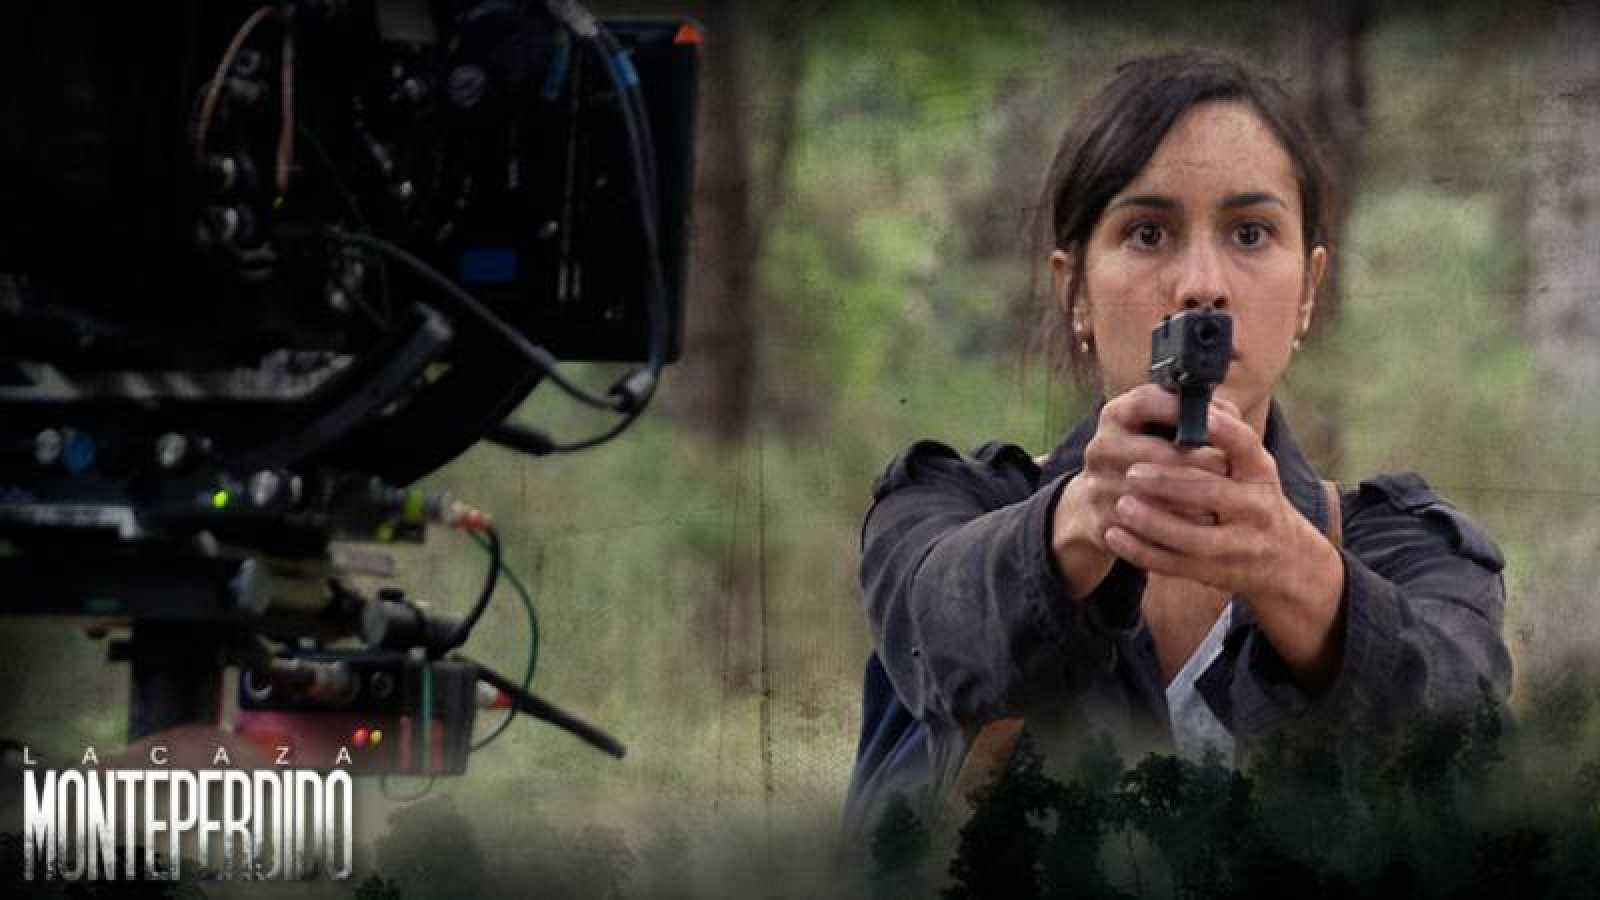 'La Caza. Monteperdido', un thriller de Agustín Martínez